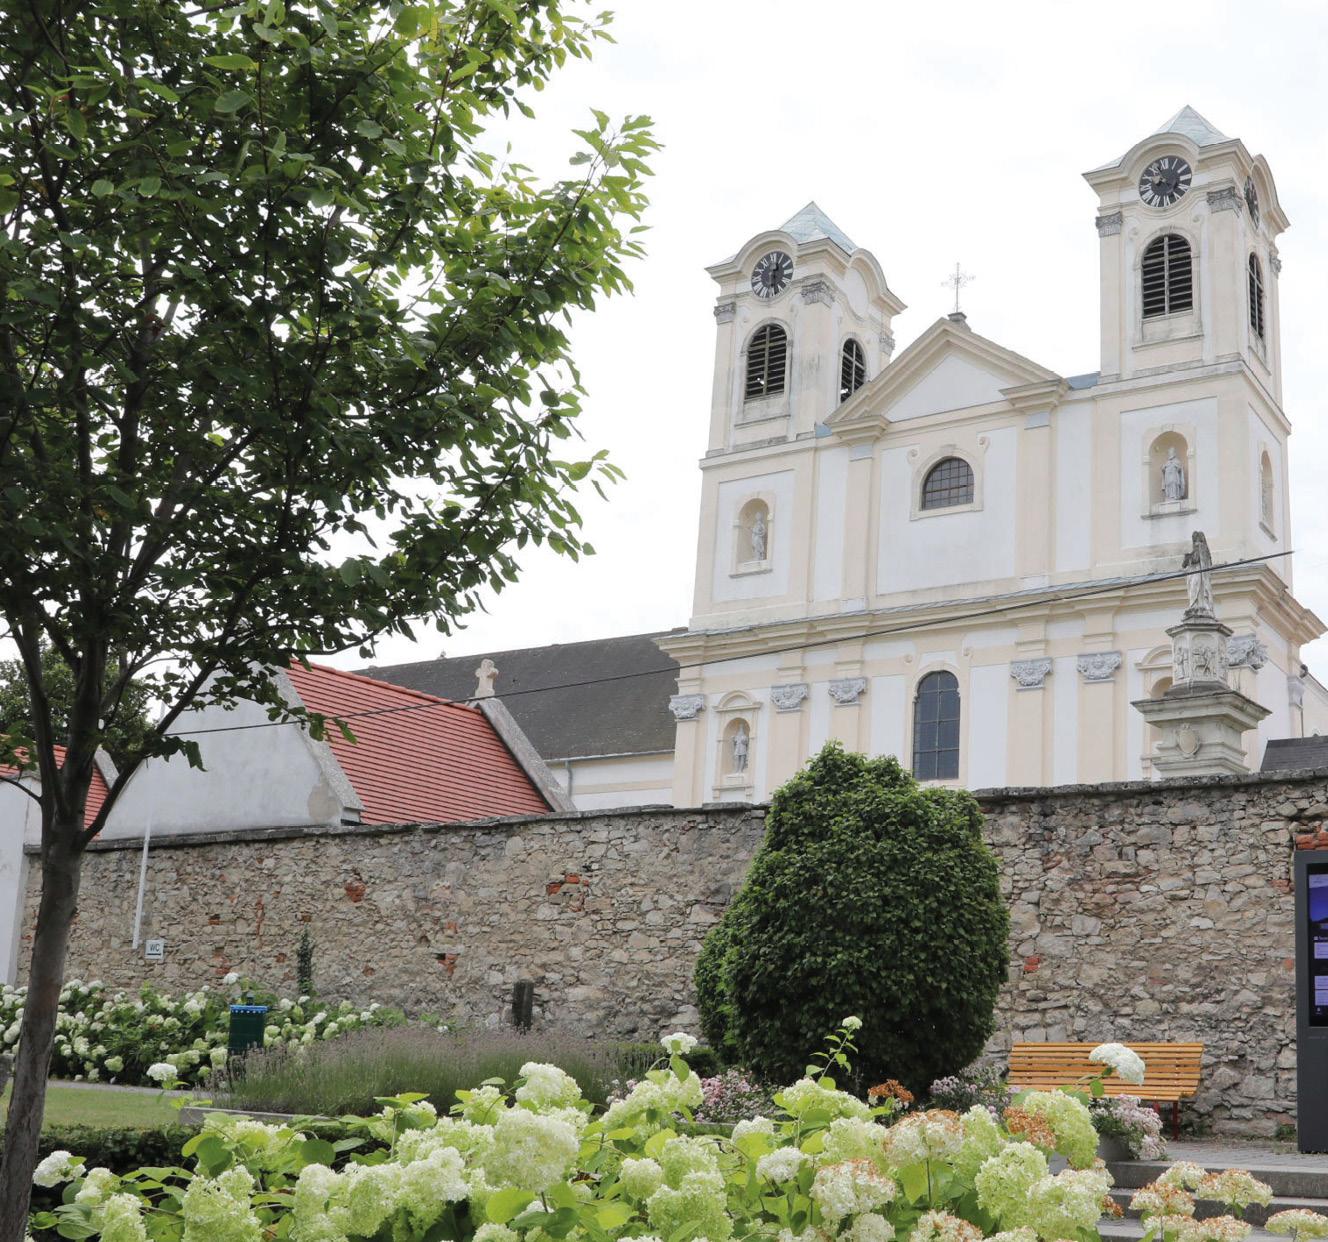 Wallfahrtskirche Loretto